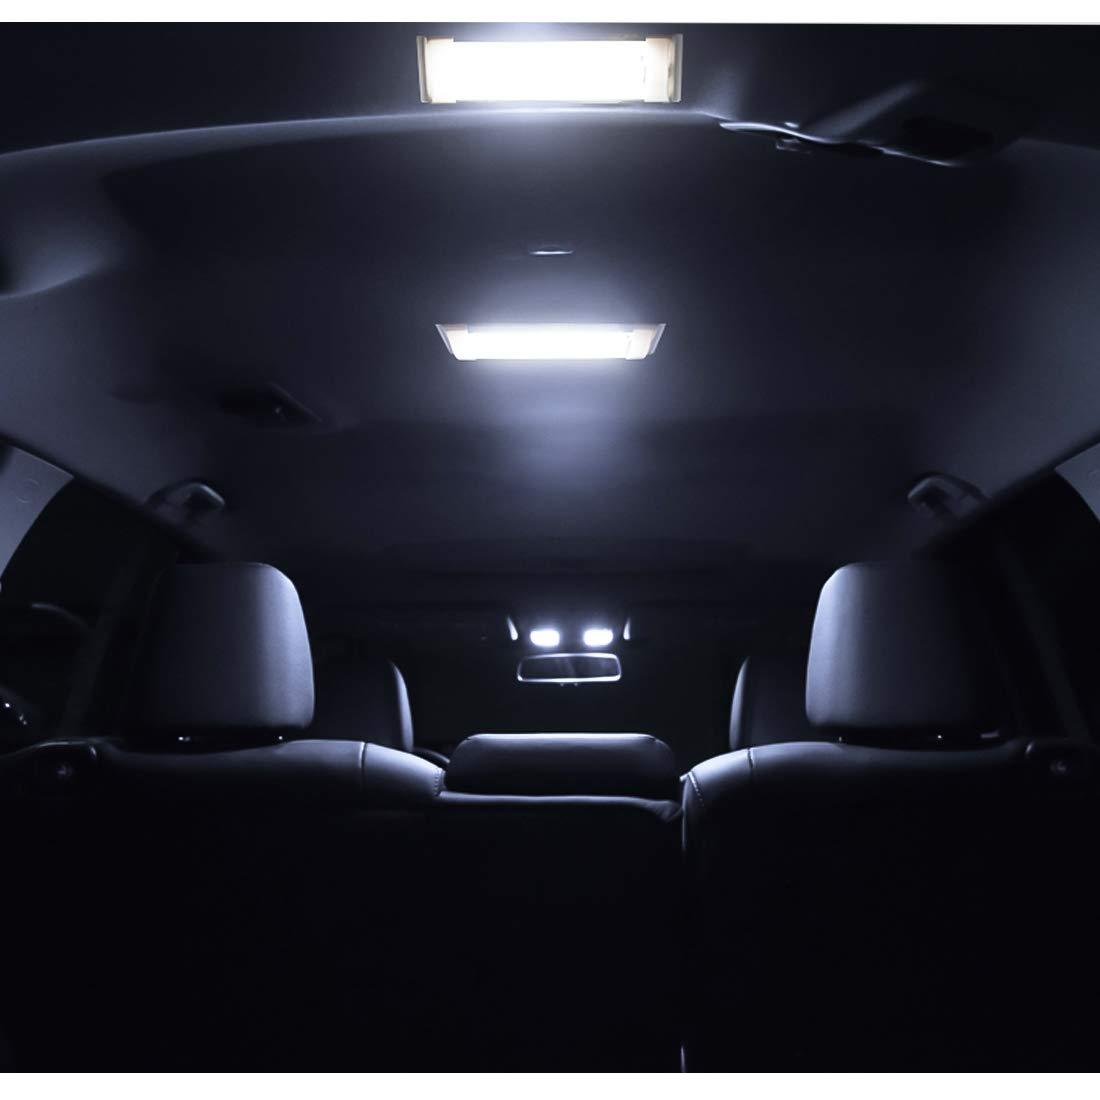 2 Unidades + 2 Cables Extendidos 72 LED Iluminaci/ón Interior para RV//Camper//Trailer//Motorhome//Van//Boat con Interruptor de Encendido//Apagado SUPAREE Luces de Techo LED RV de 12 V-80 V